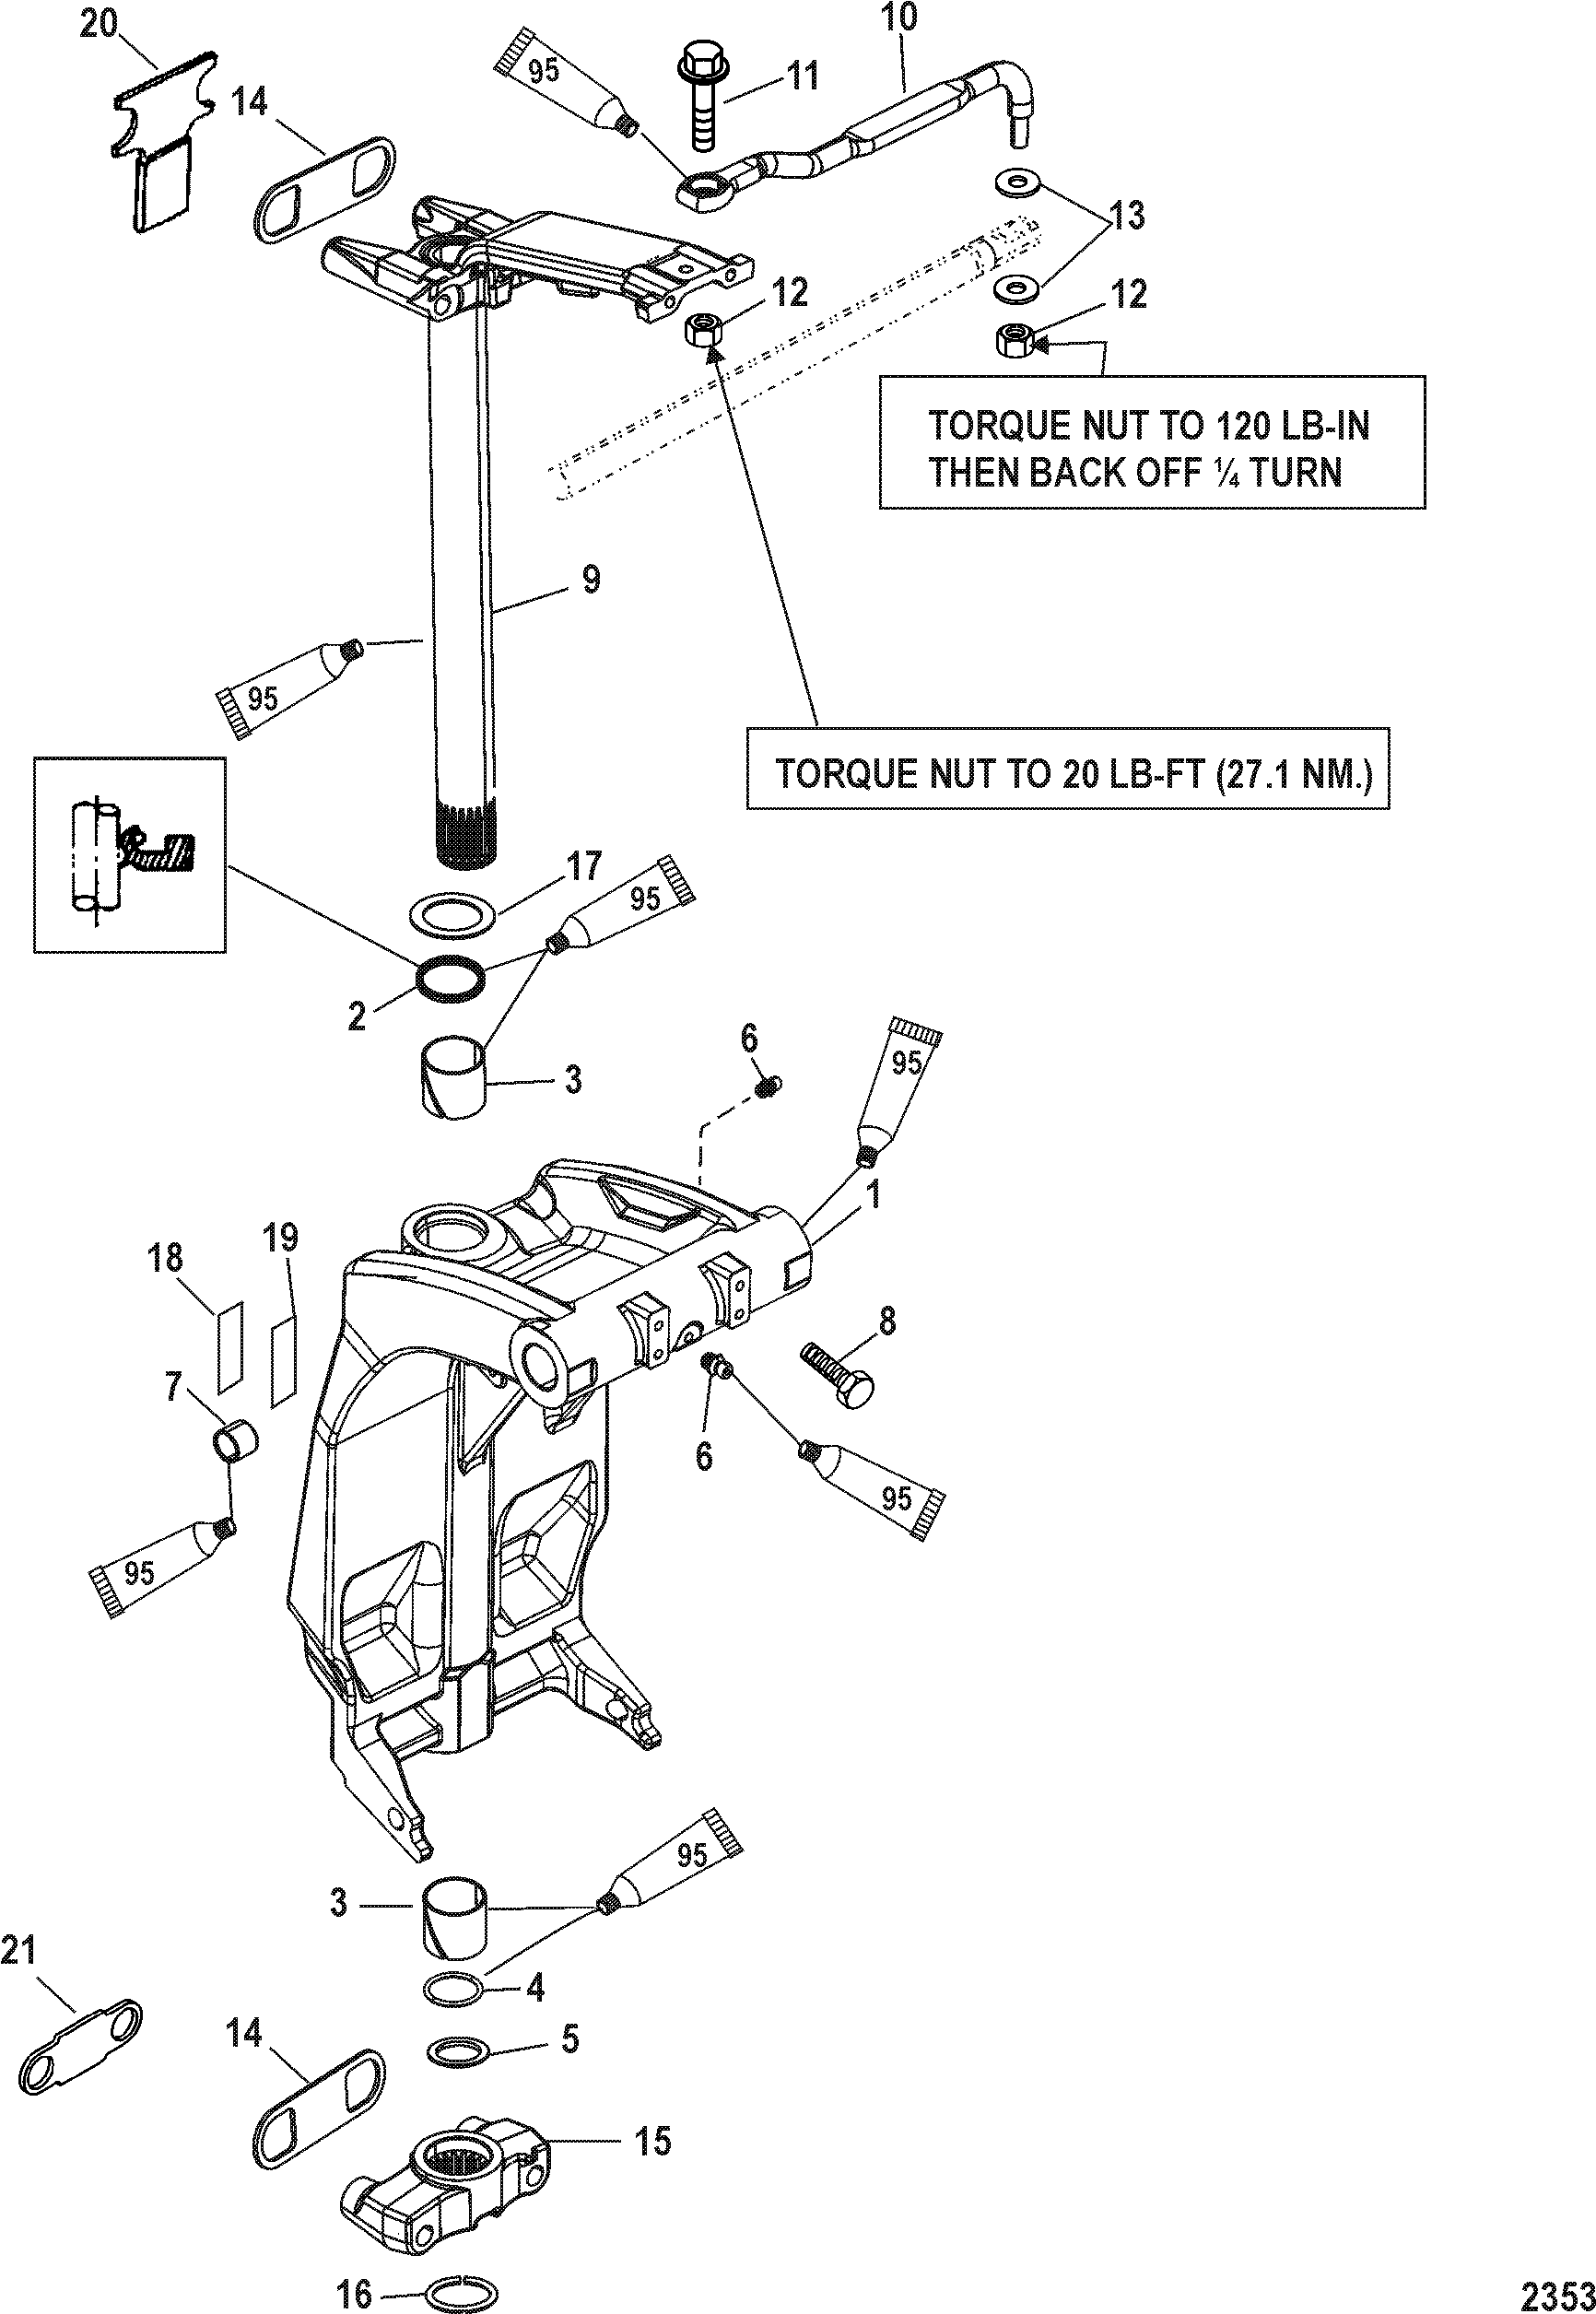 Swivel Bracket And Steering Arm For Mariner Mercury 100